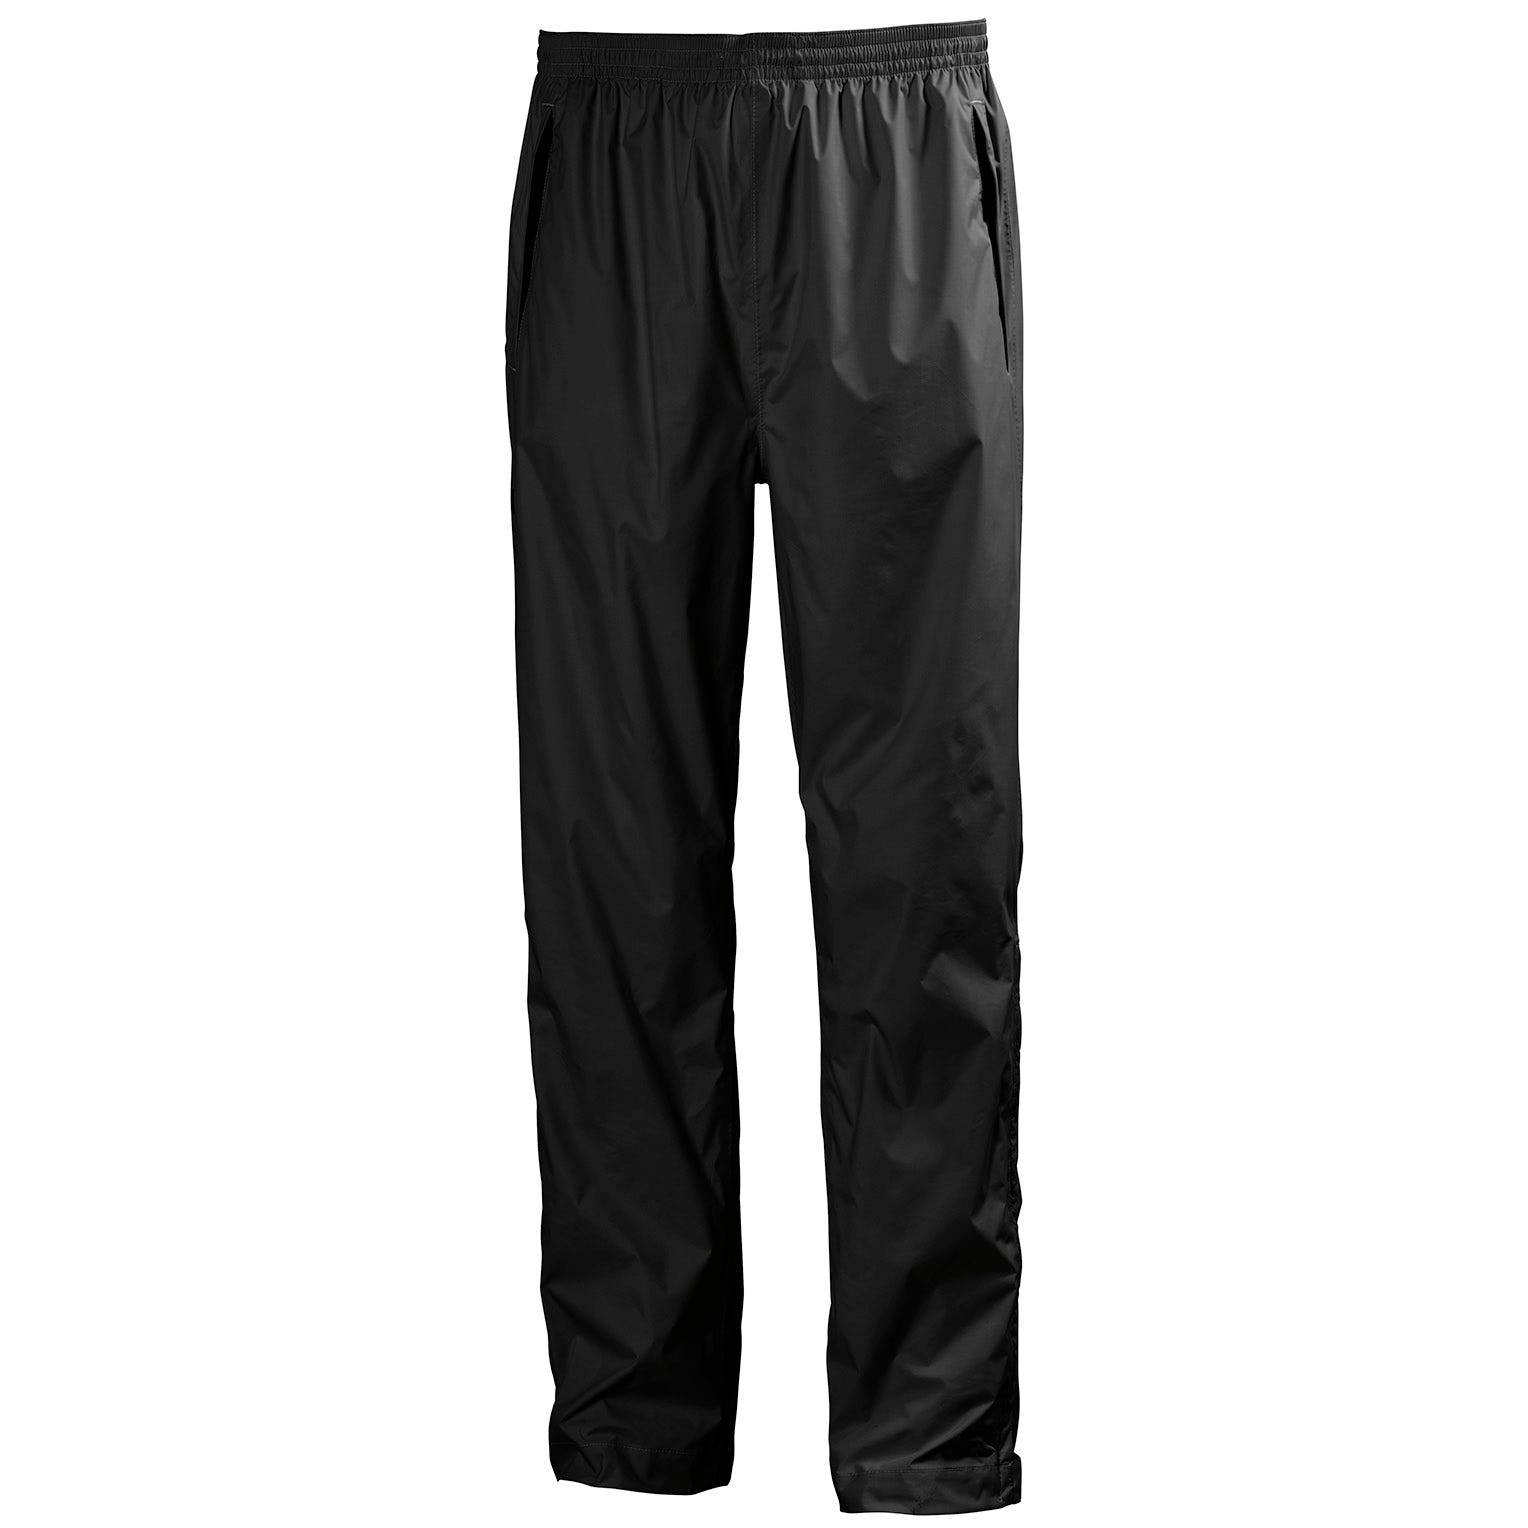 Helly Hansen Loke Pants Mens Hiking Pant Black XL